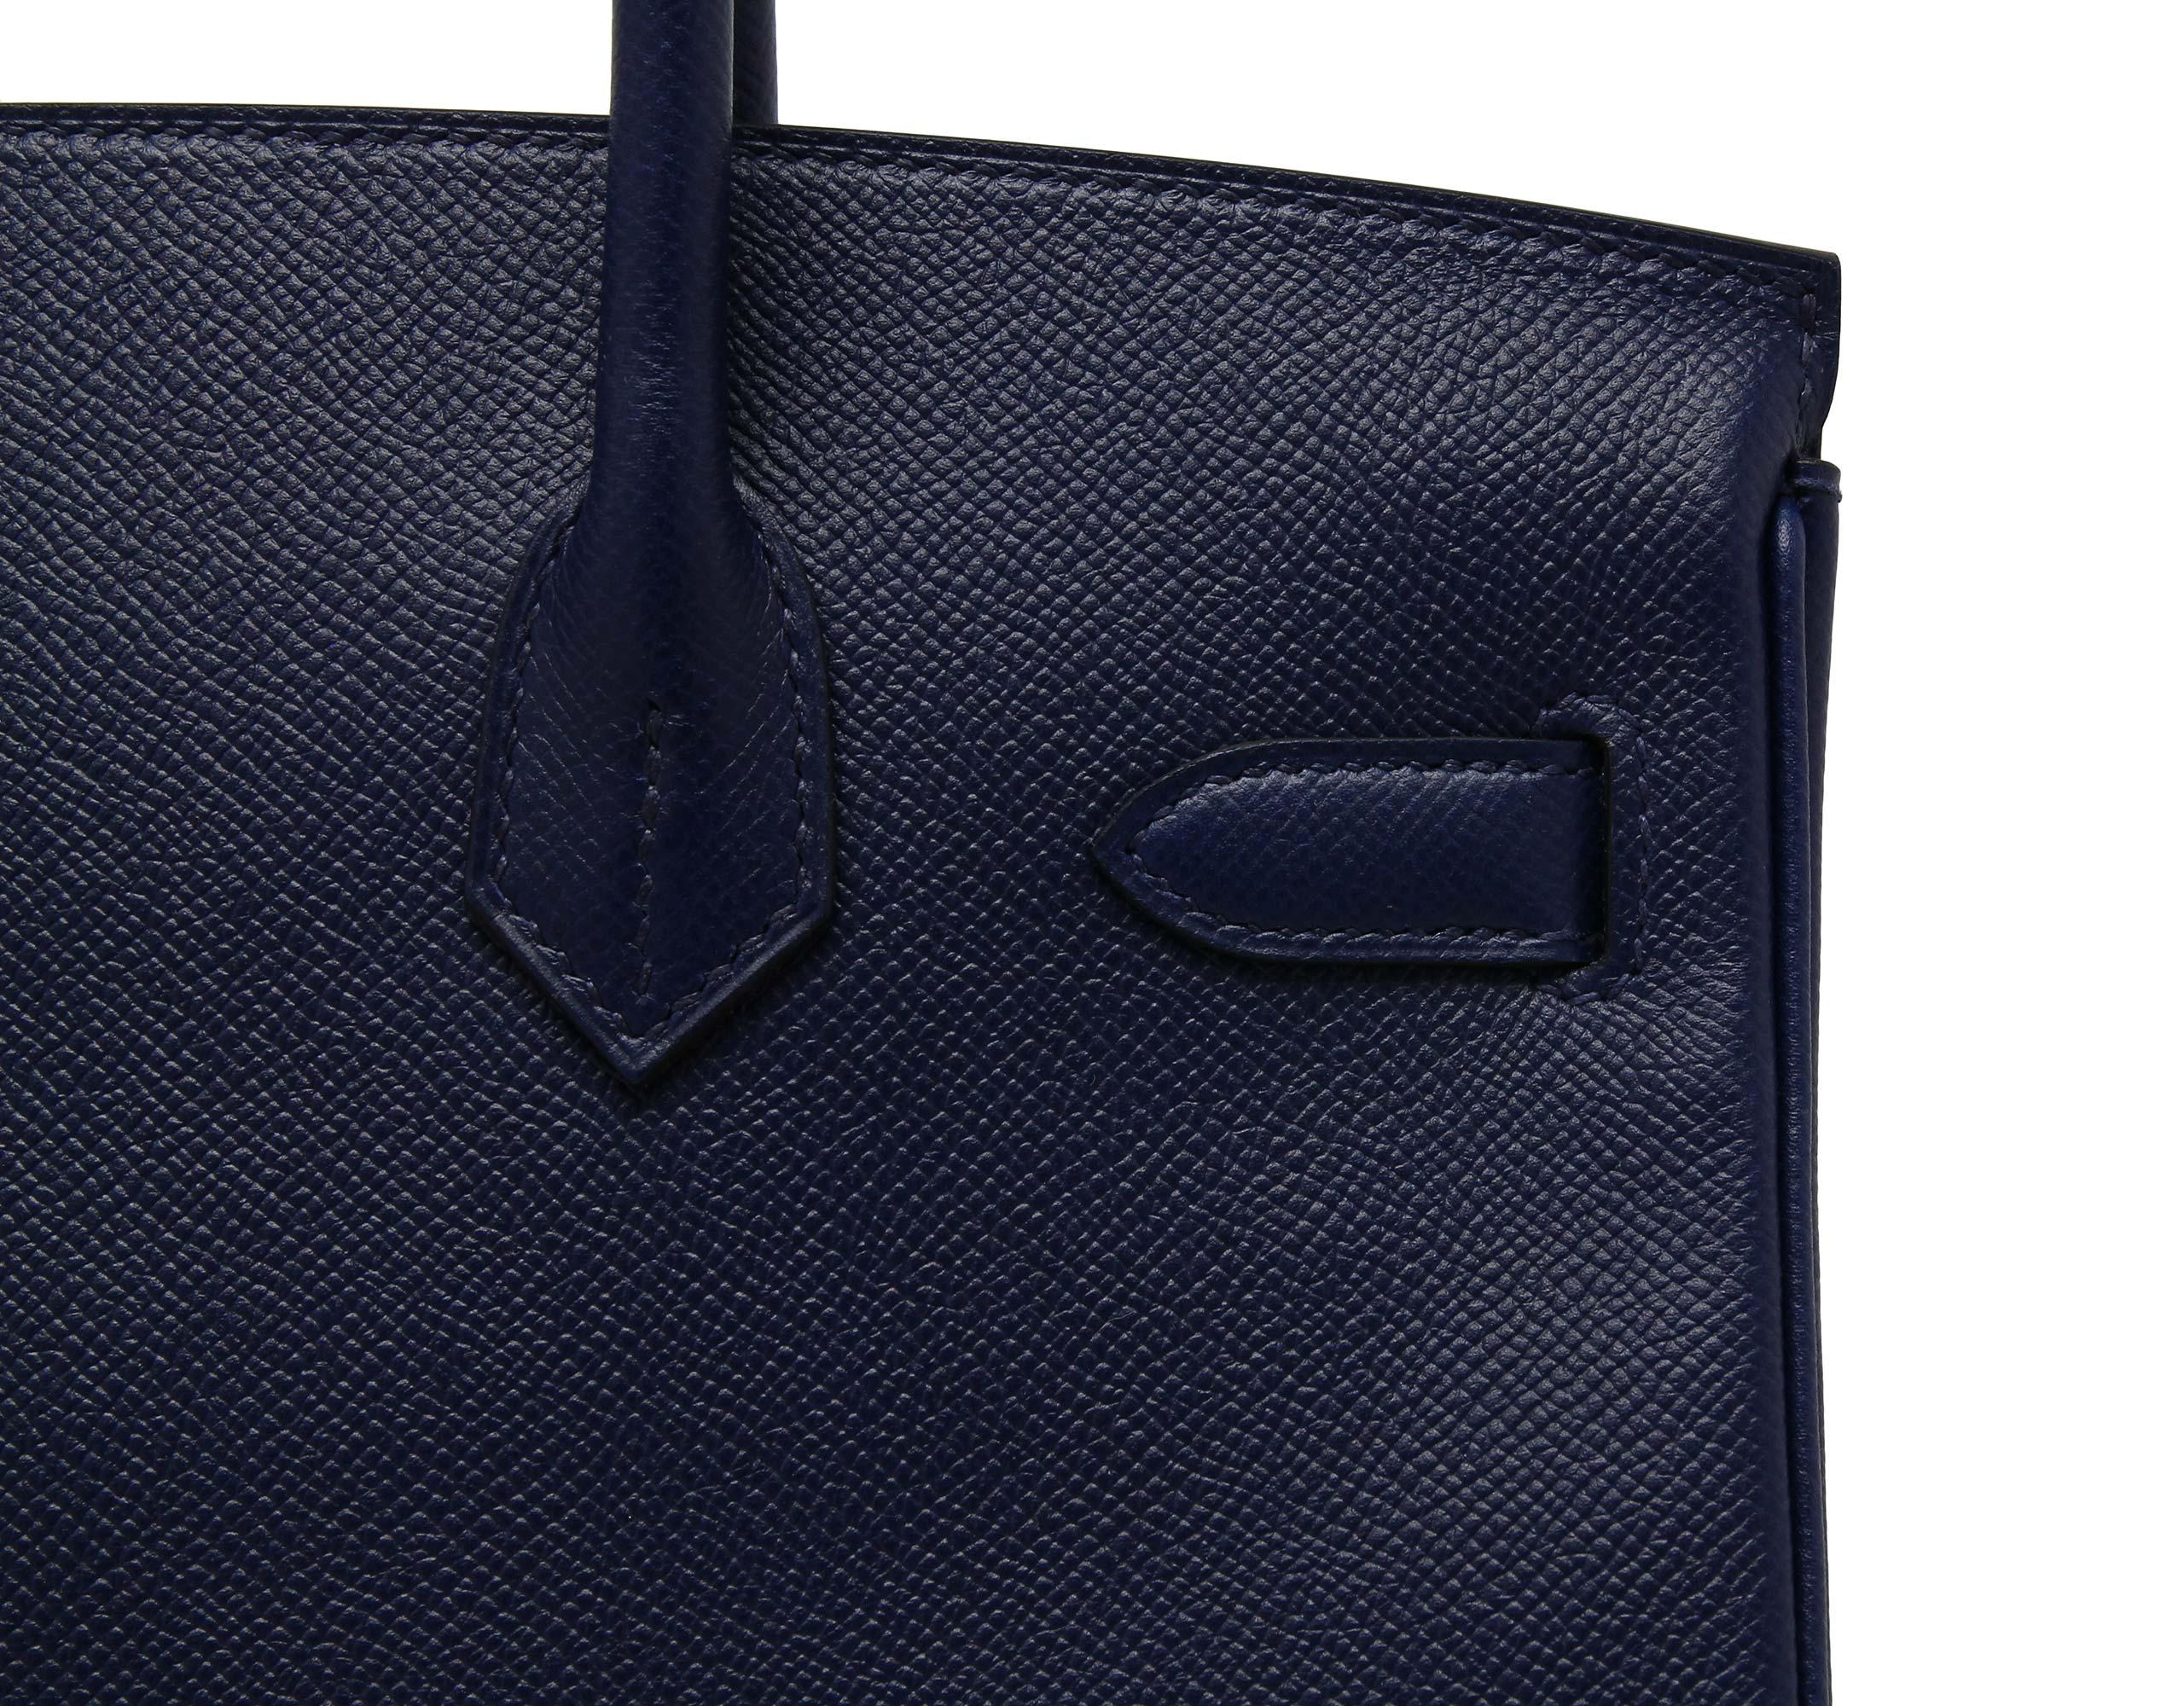 Hermes Birkin Blue Sapphire Epsom with Palladium